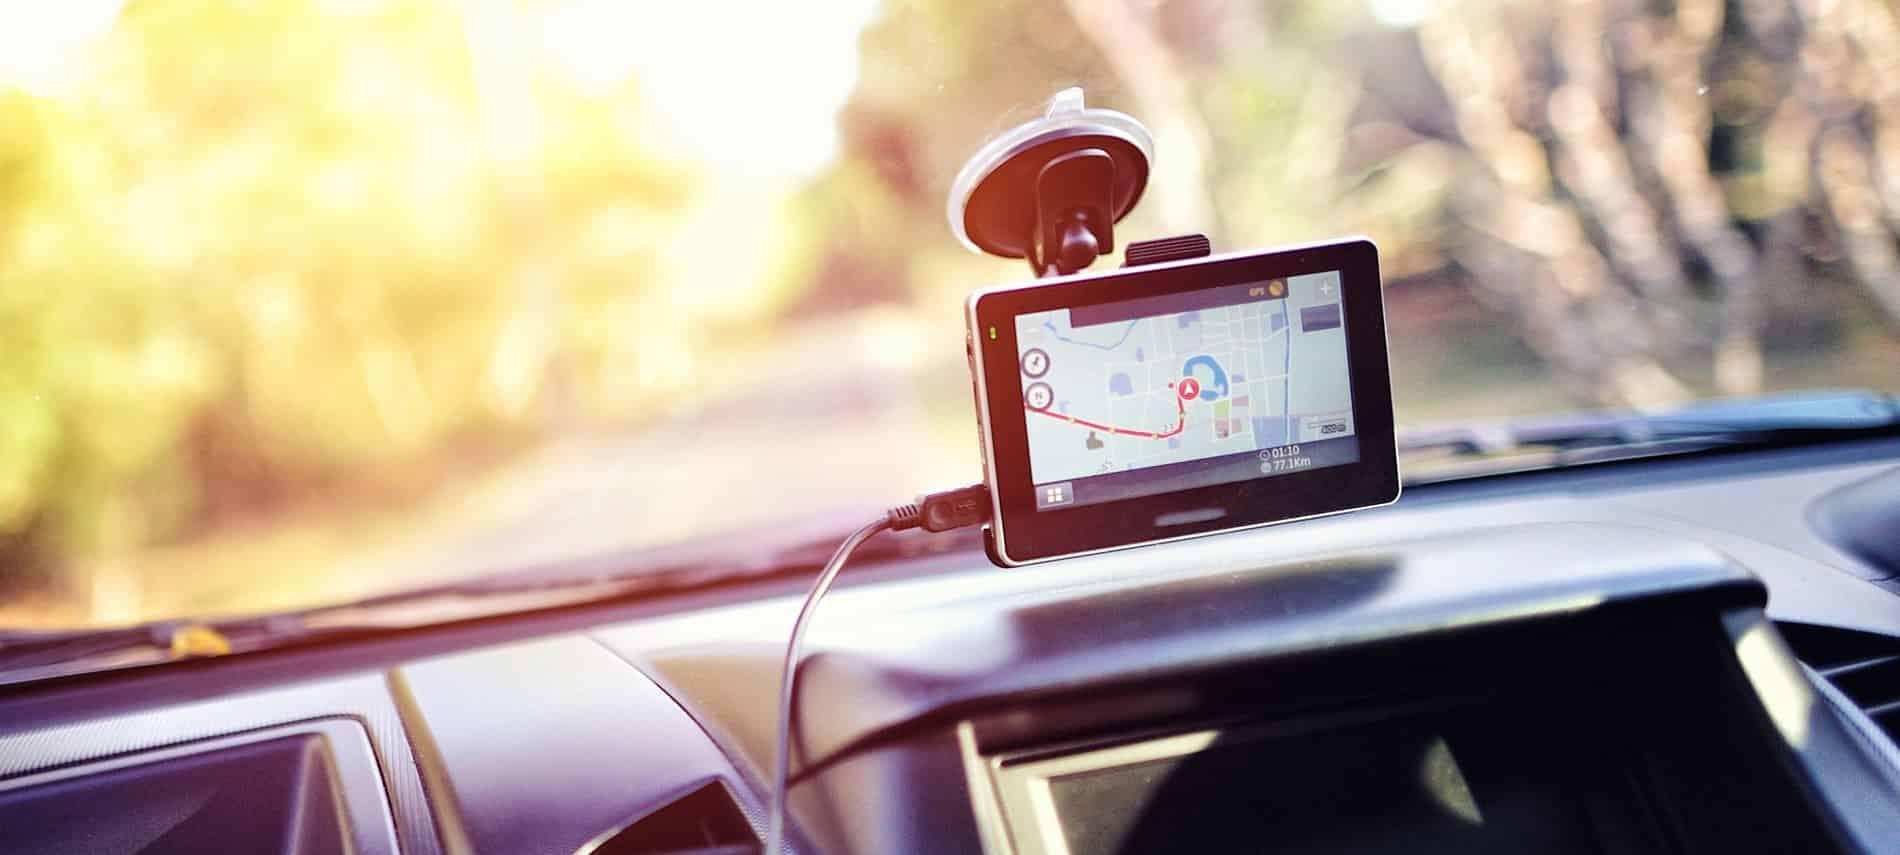 GPS unit on windsheild